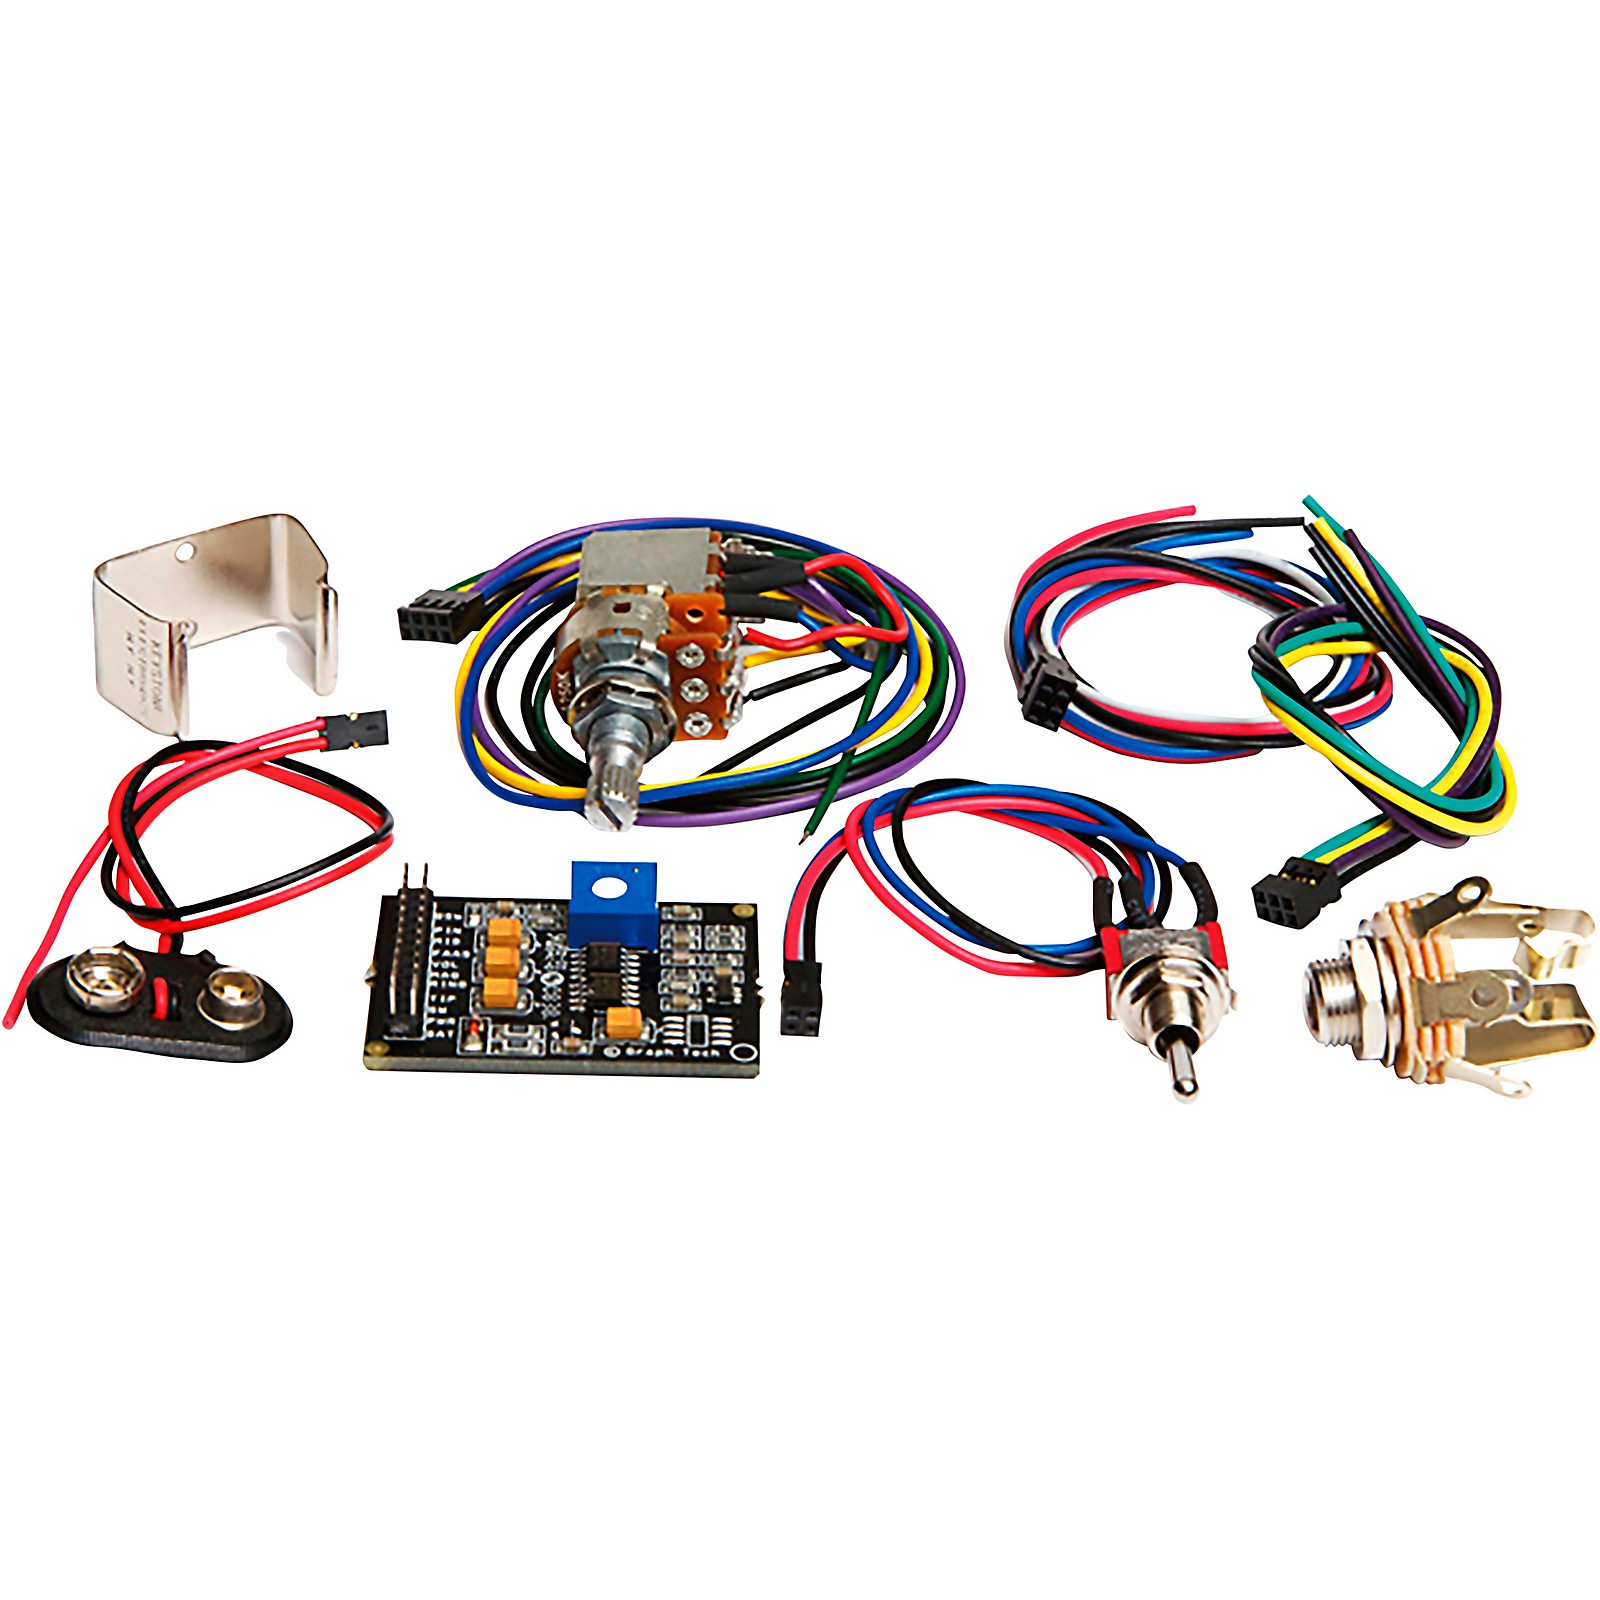 Open Box Graph Tech Acousti-Phonic Kit for Guitar